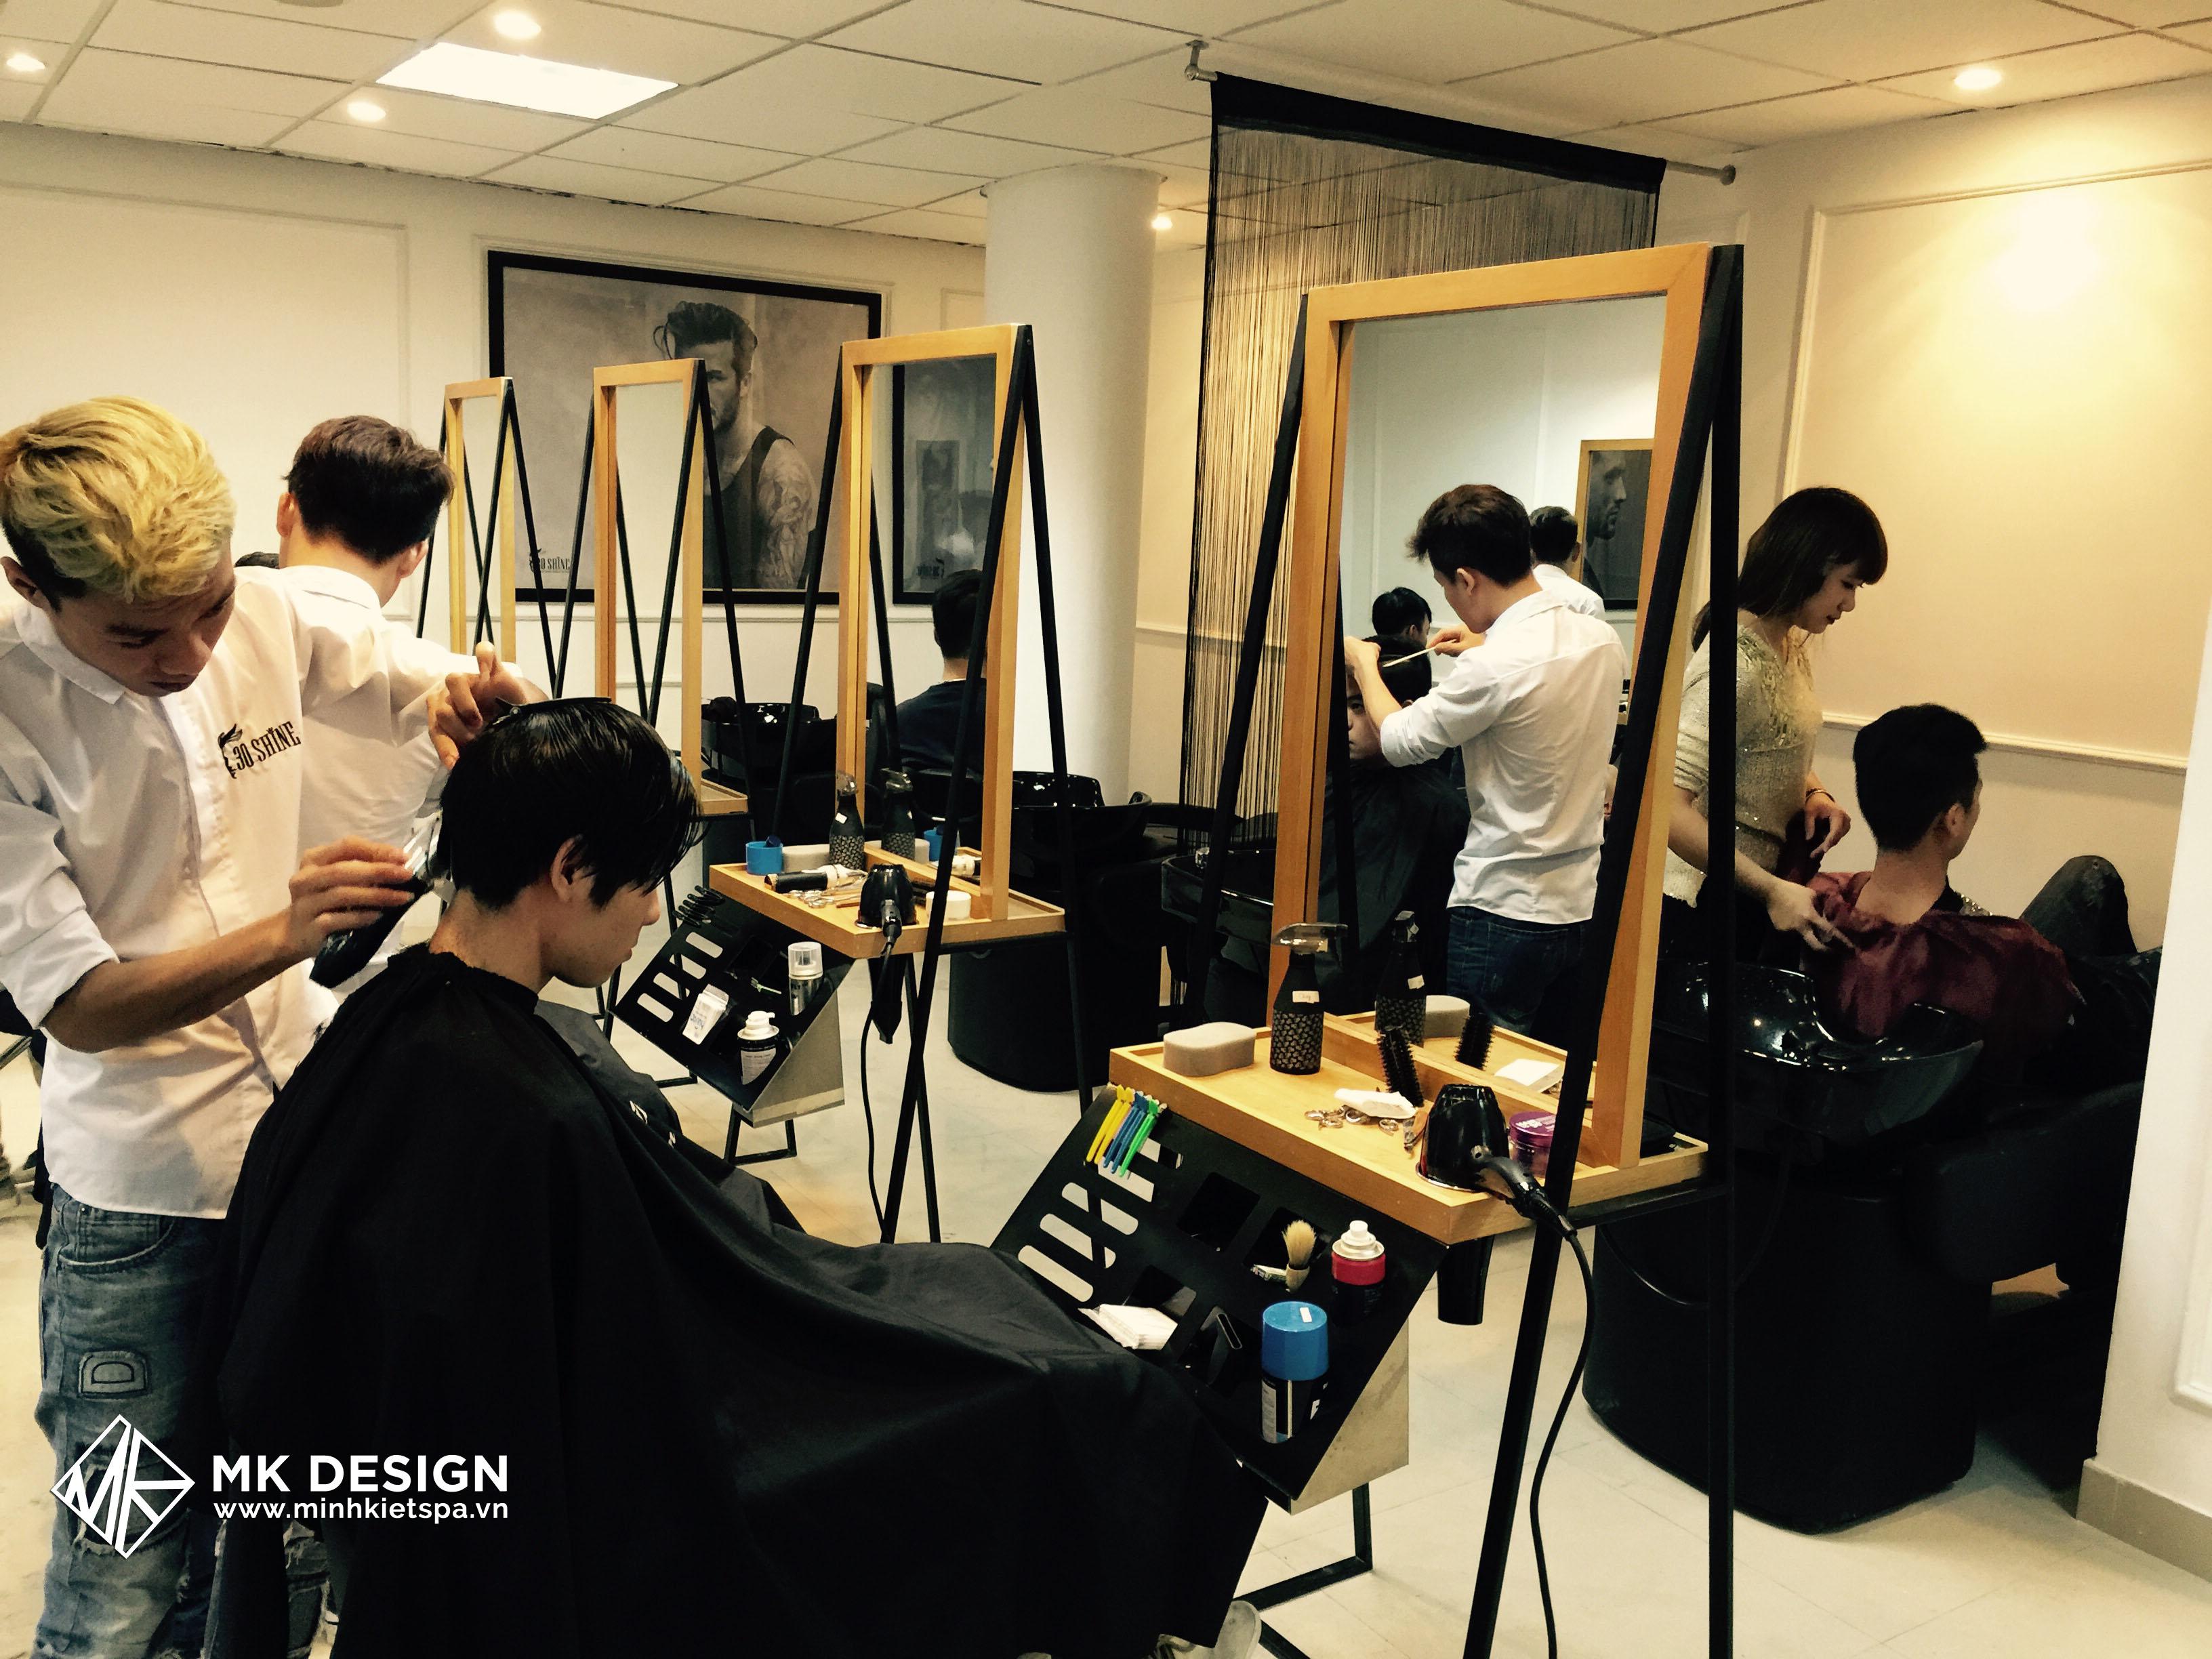 Thiết Kế Hair Salon 30 Shine - Mẫu Thiết Kế Hair Salon Hiện Đại